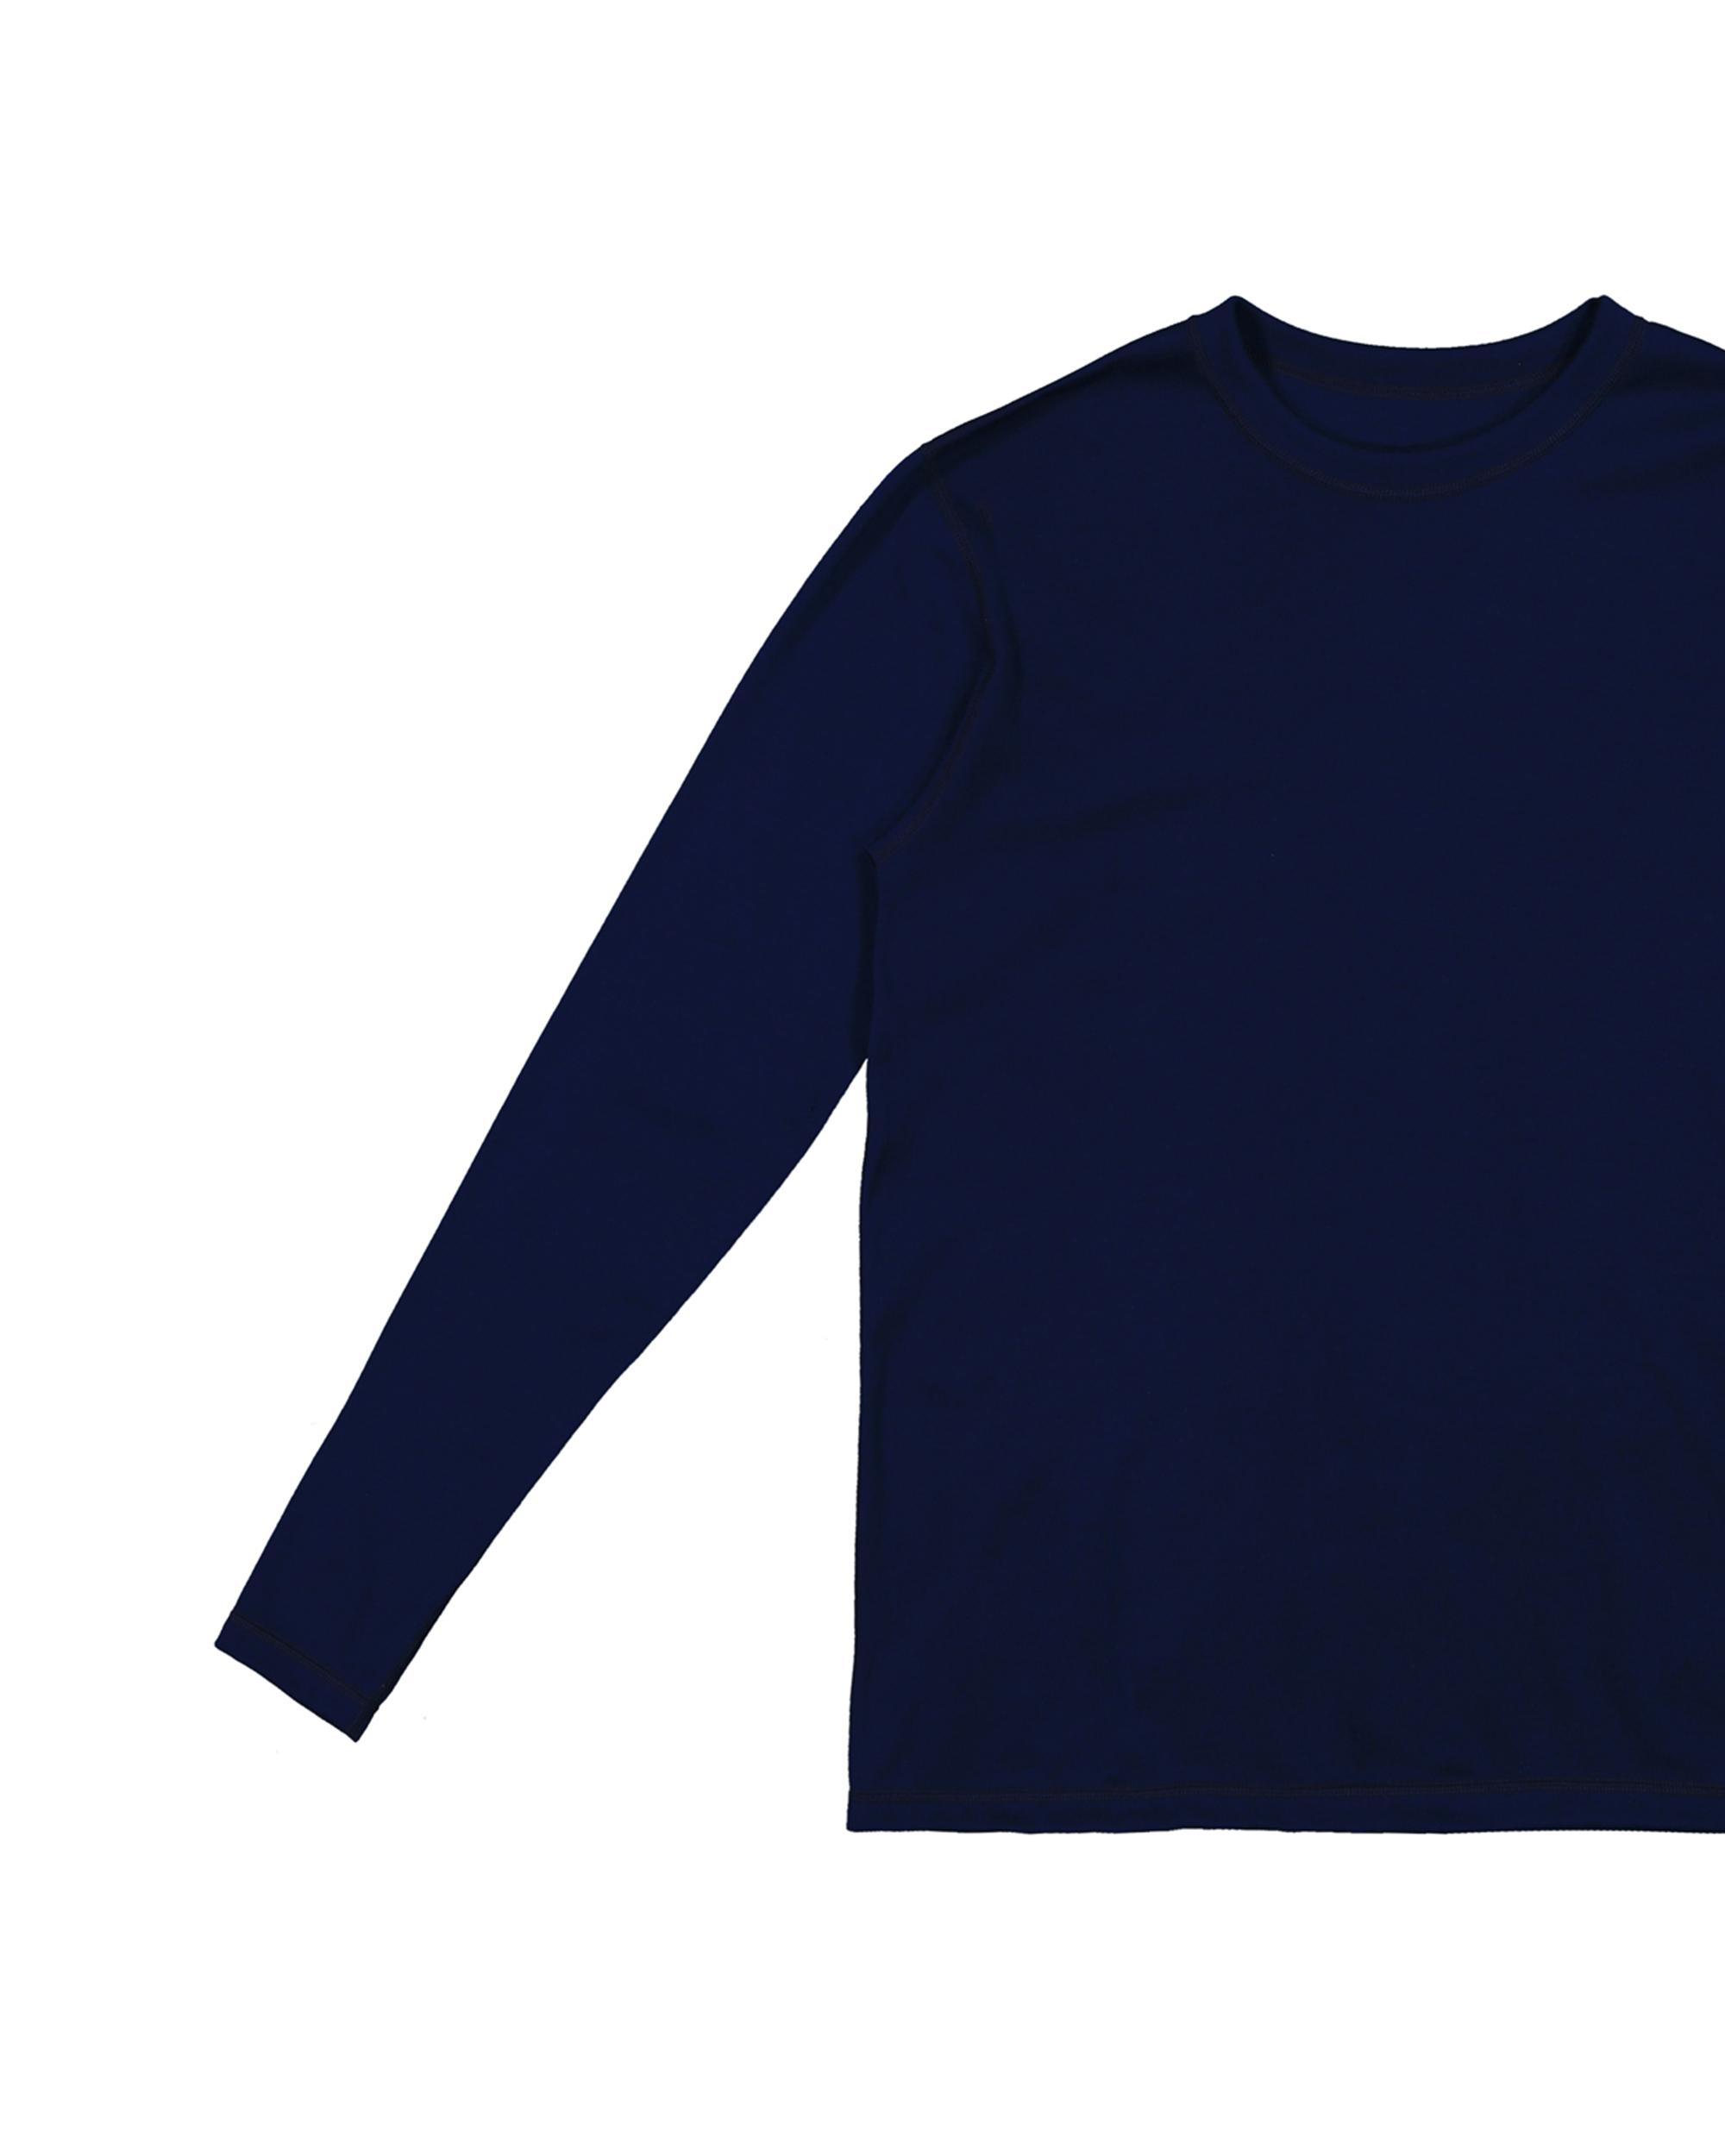 WOOL T-SHIRT (long sleeve)